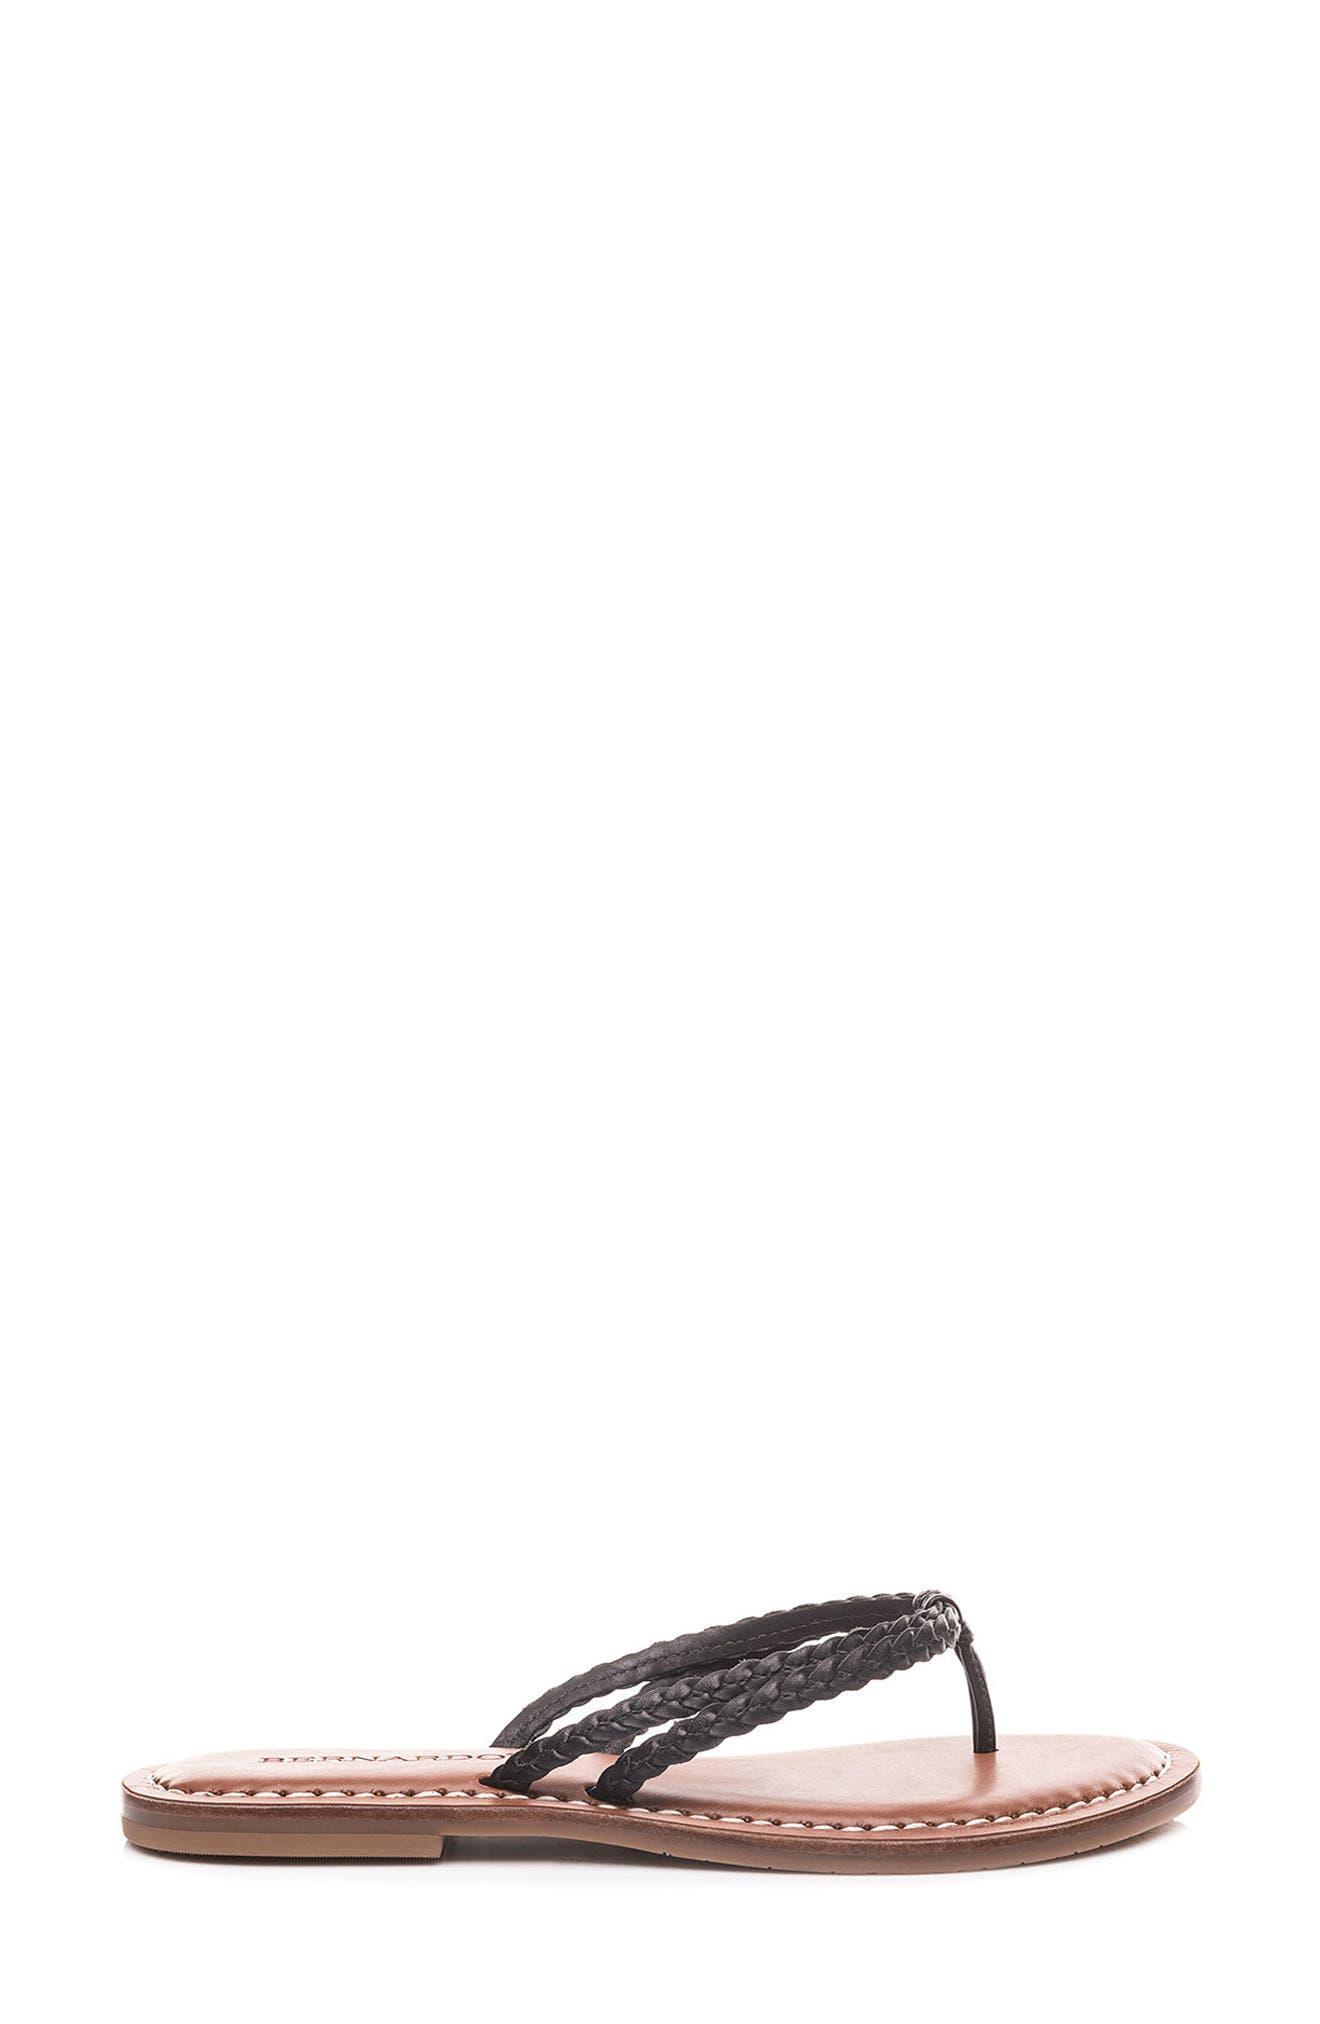 Bernardo Greta Braided Strap Sandal,                             Alternate thumbnail 3, color,                             Black Leather